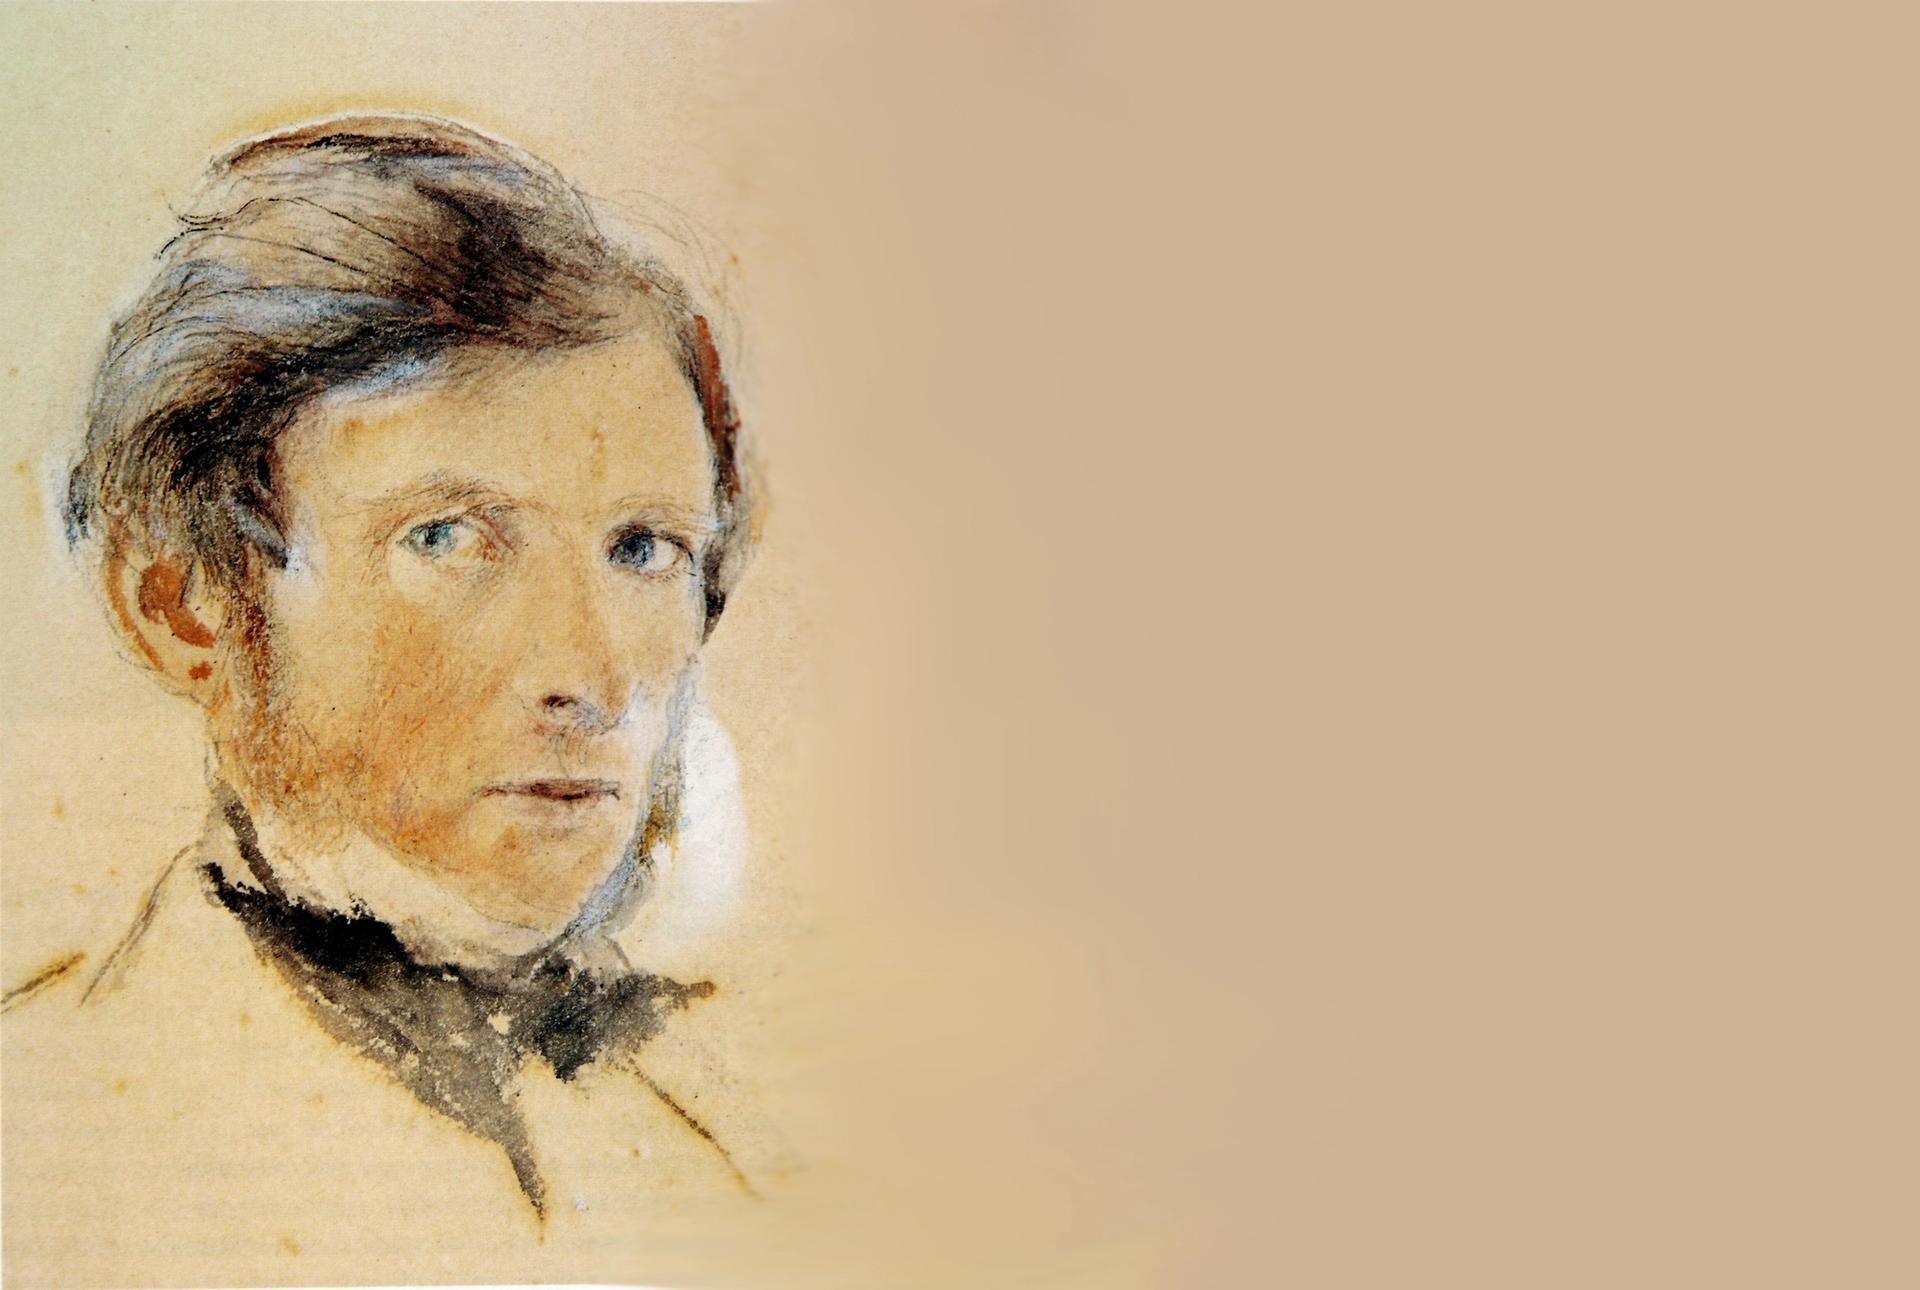 John Ruskin's self portrait (1861)